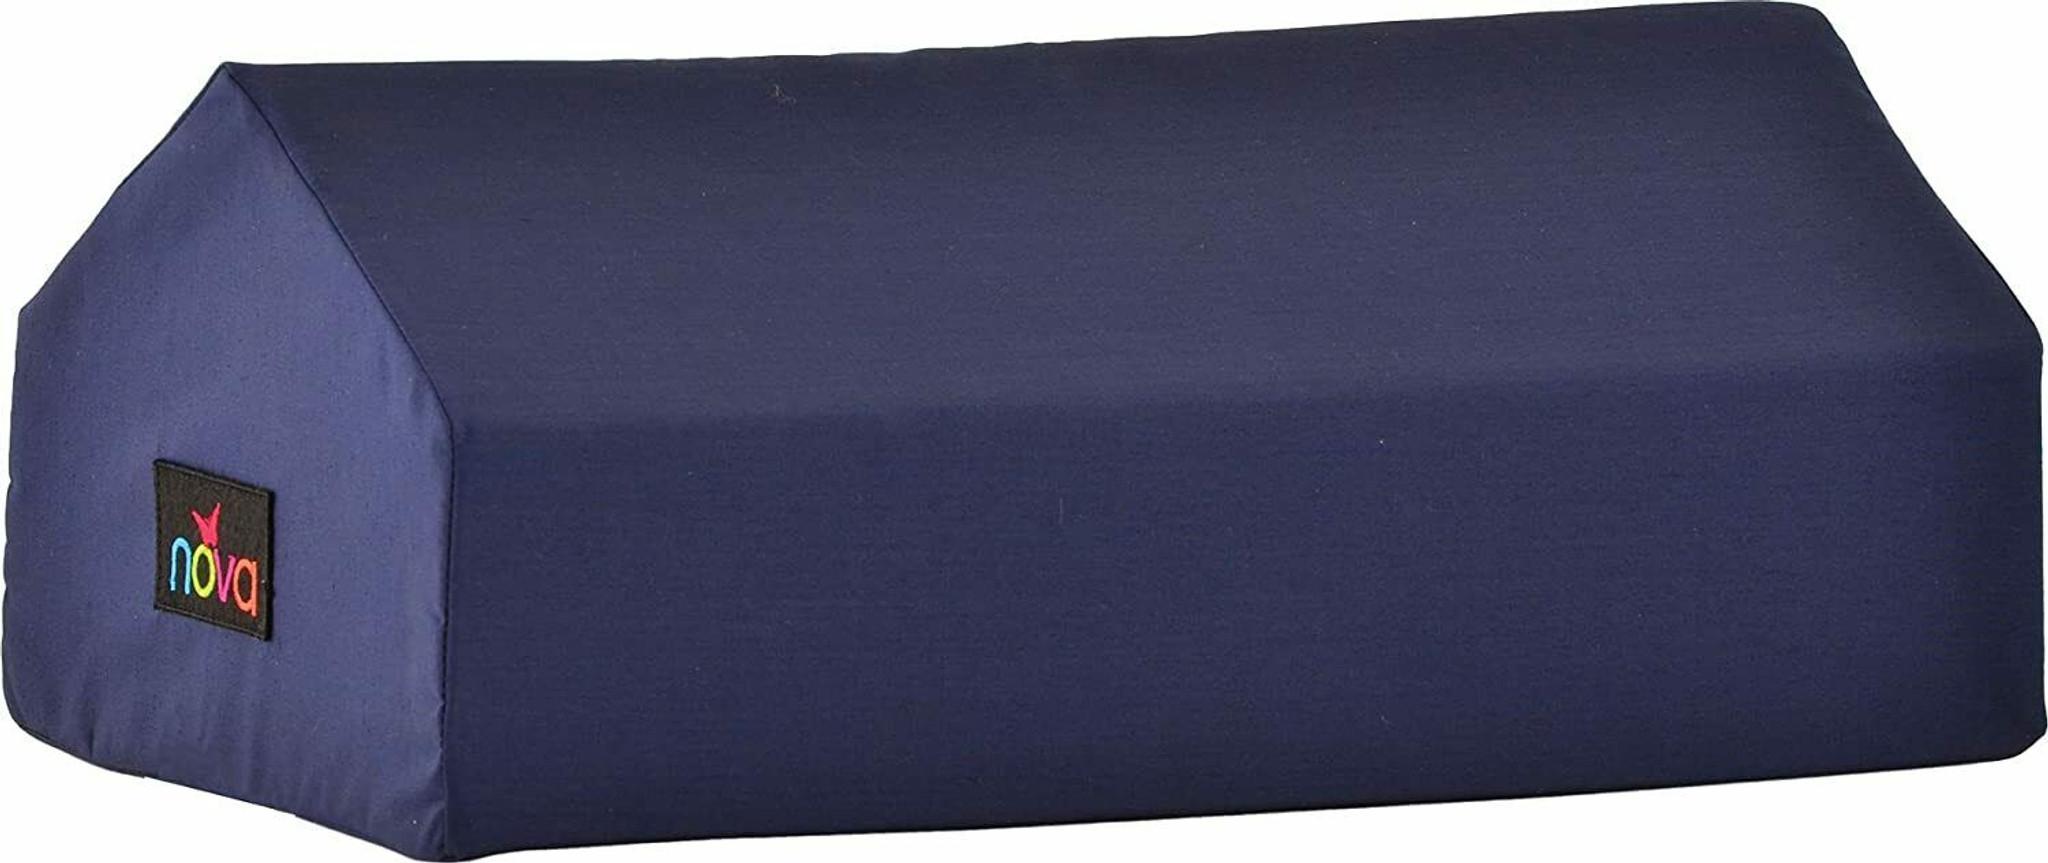 knee elevation pillow elevating leg rest pillow wedge 17 22 widths 2688 r